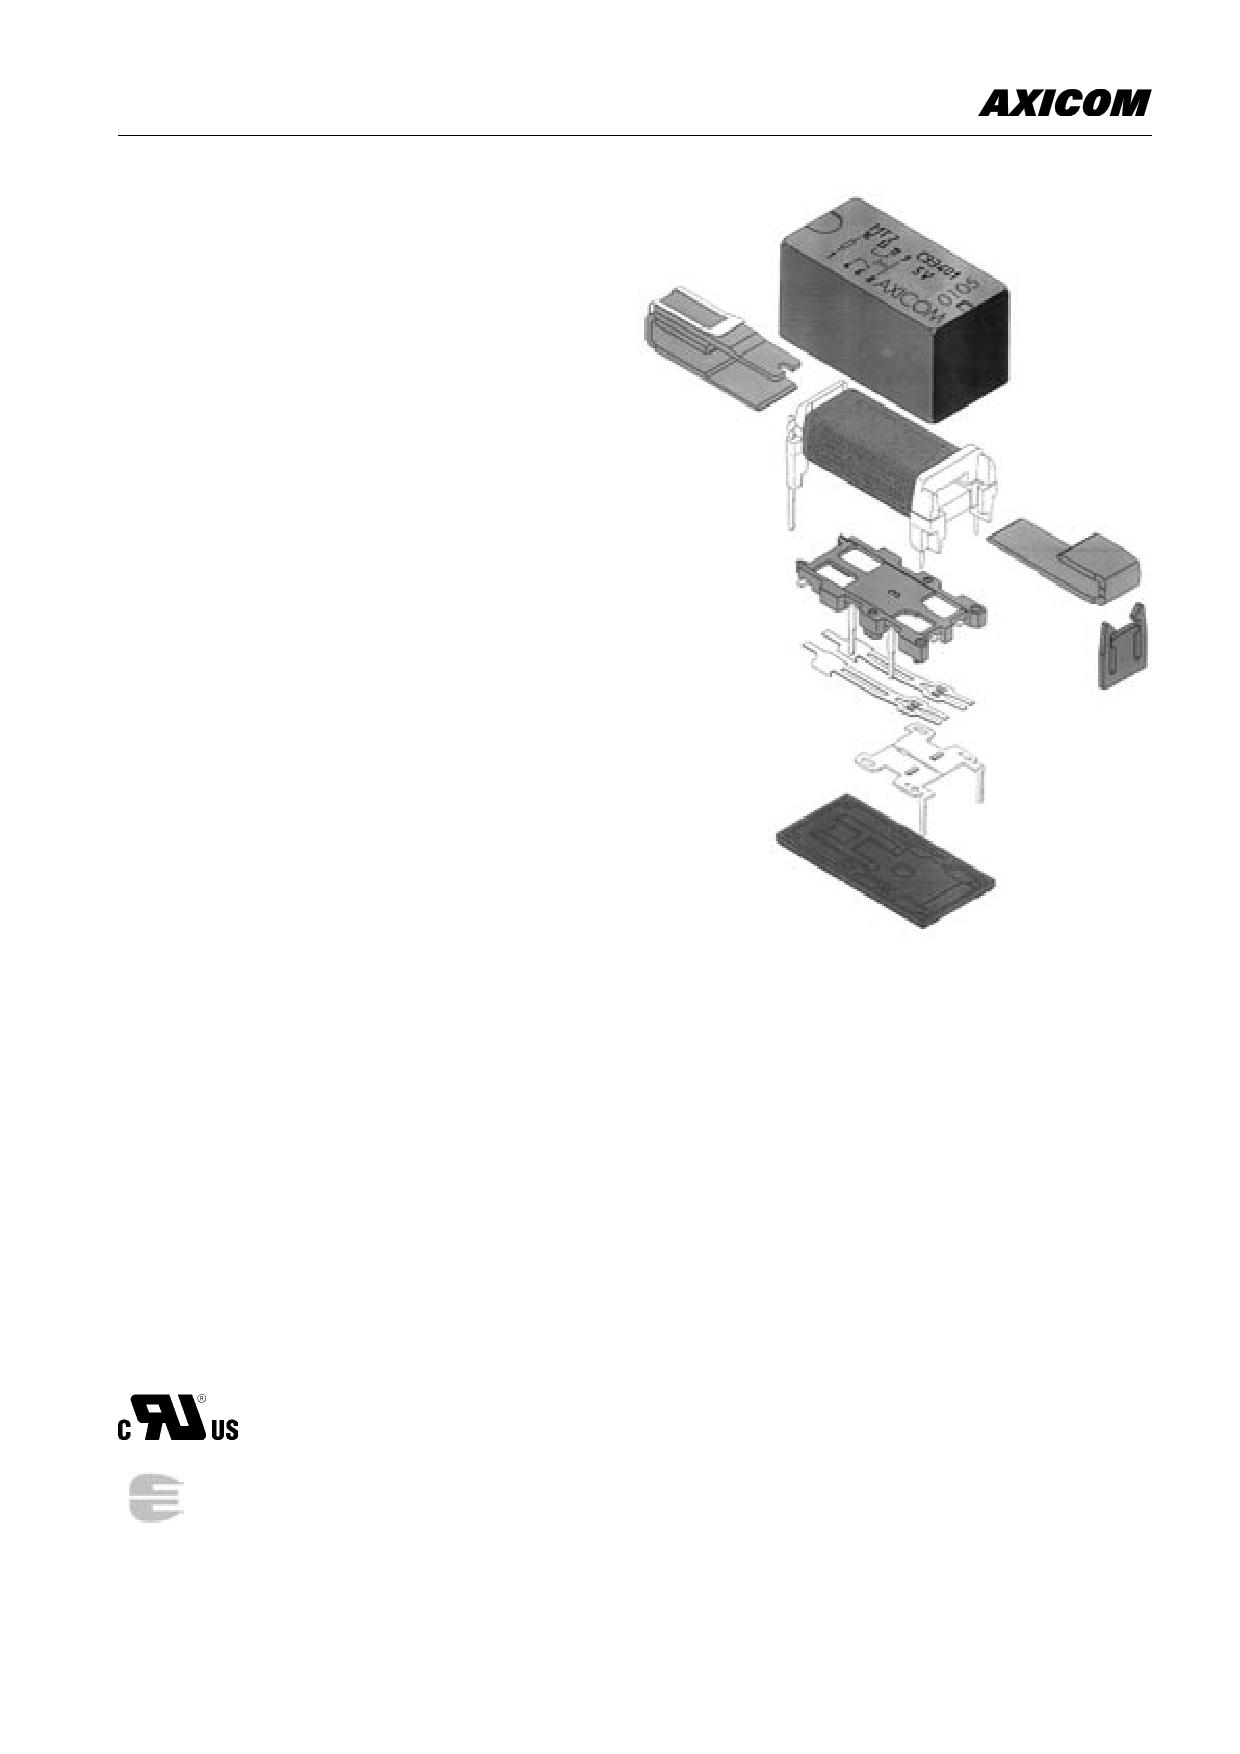 0-1462000-7 Даташит, Описание, Даташиты